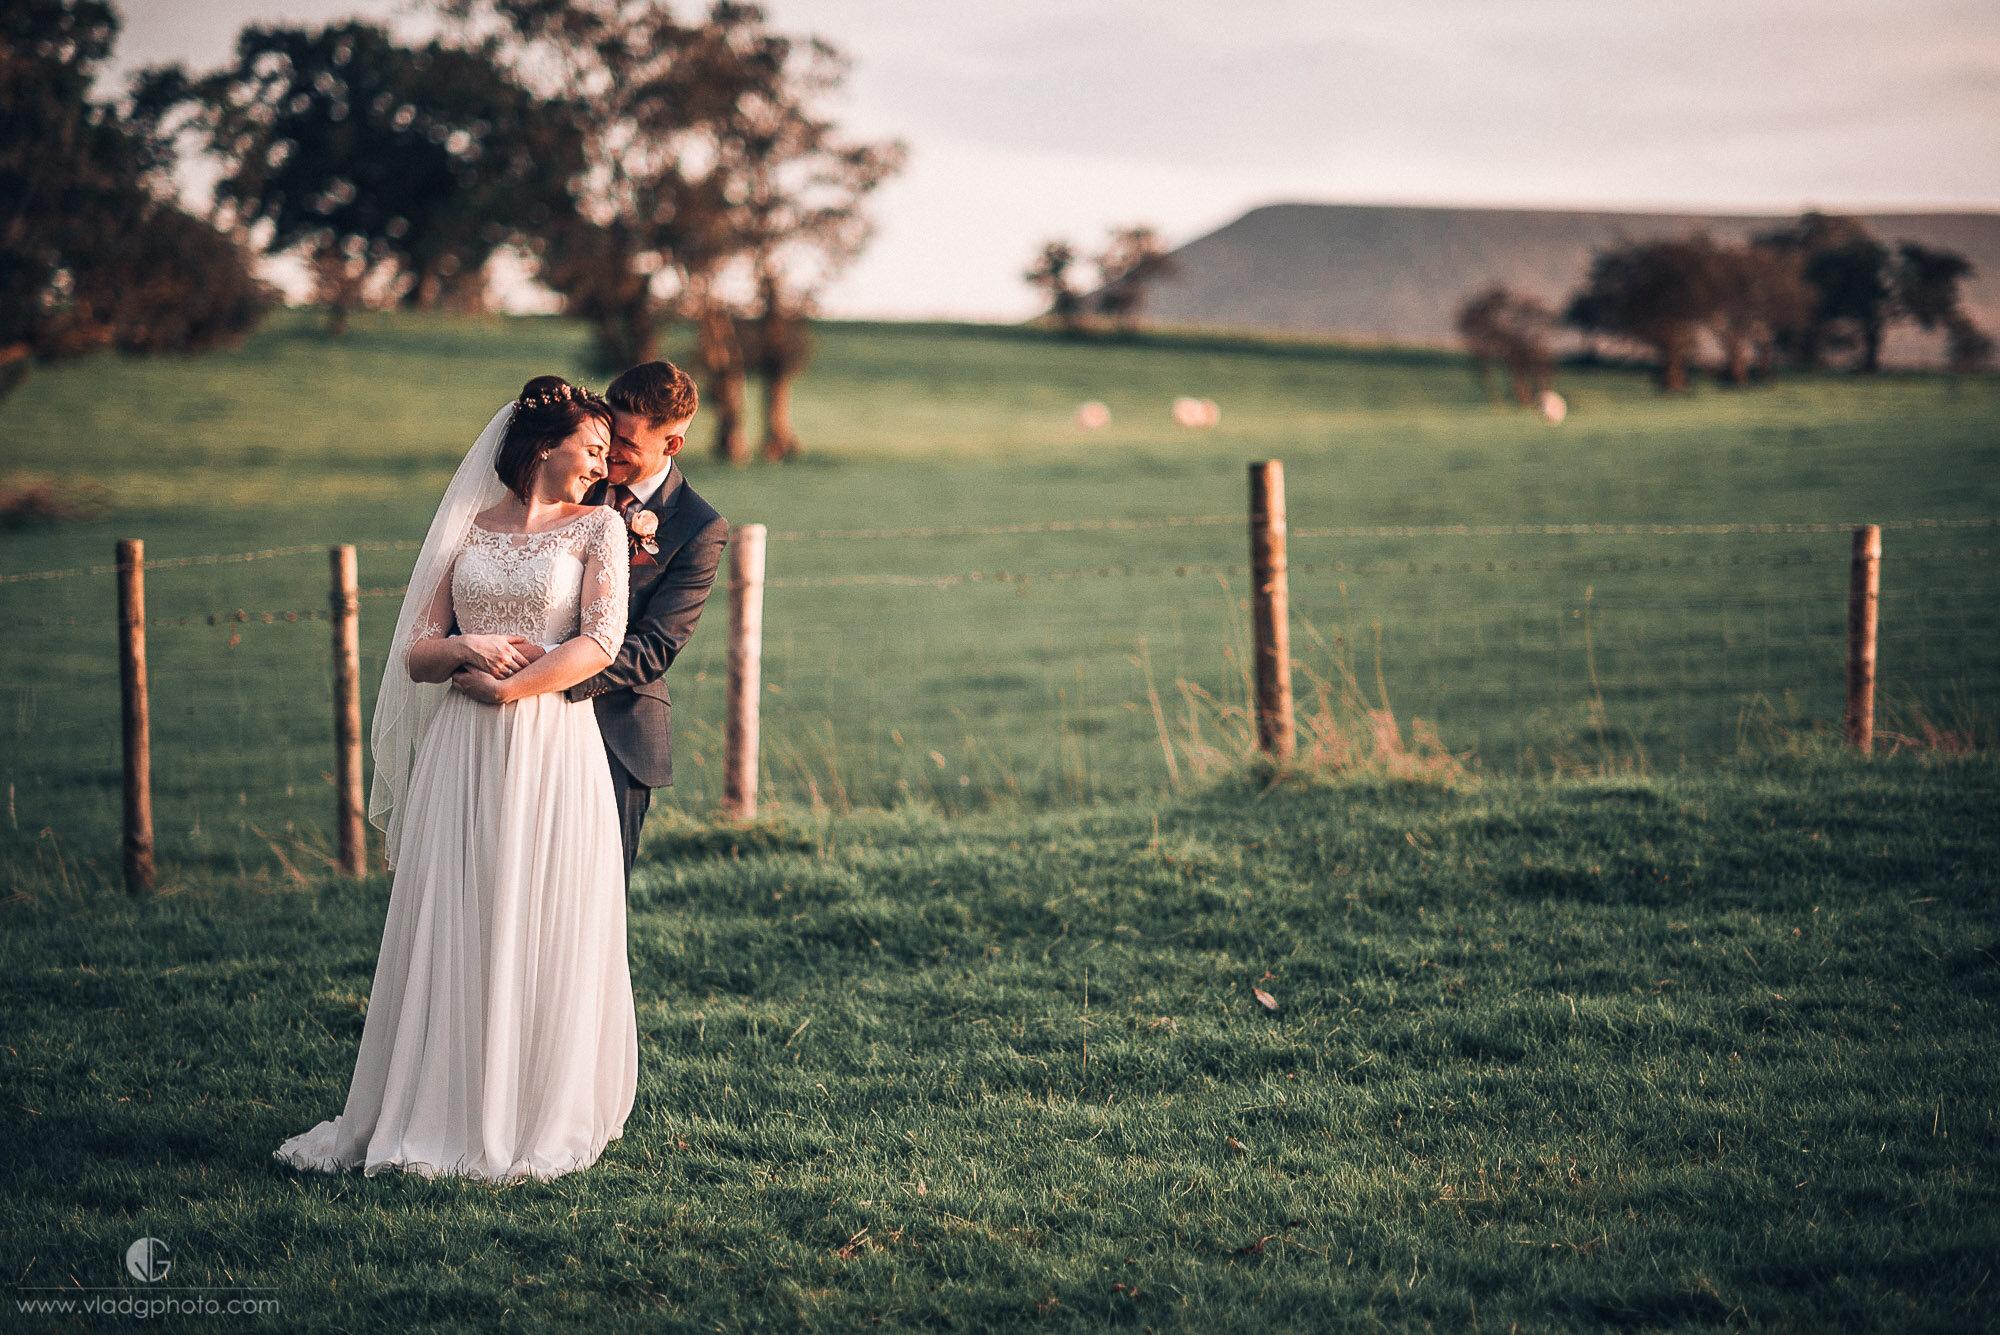 Wedding Photographer Stirk House Gisburn_8.jpg